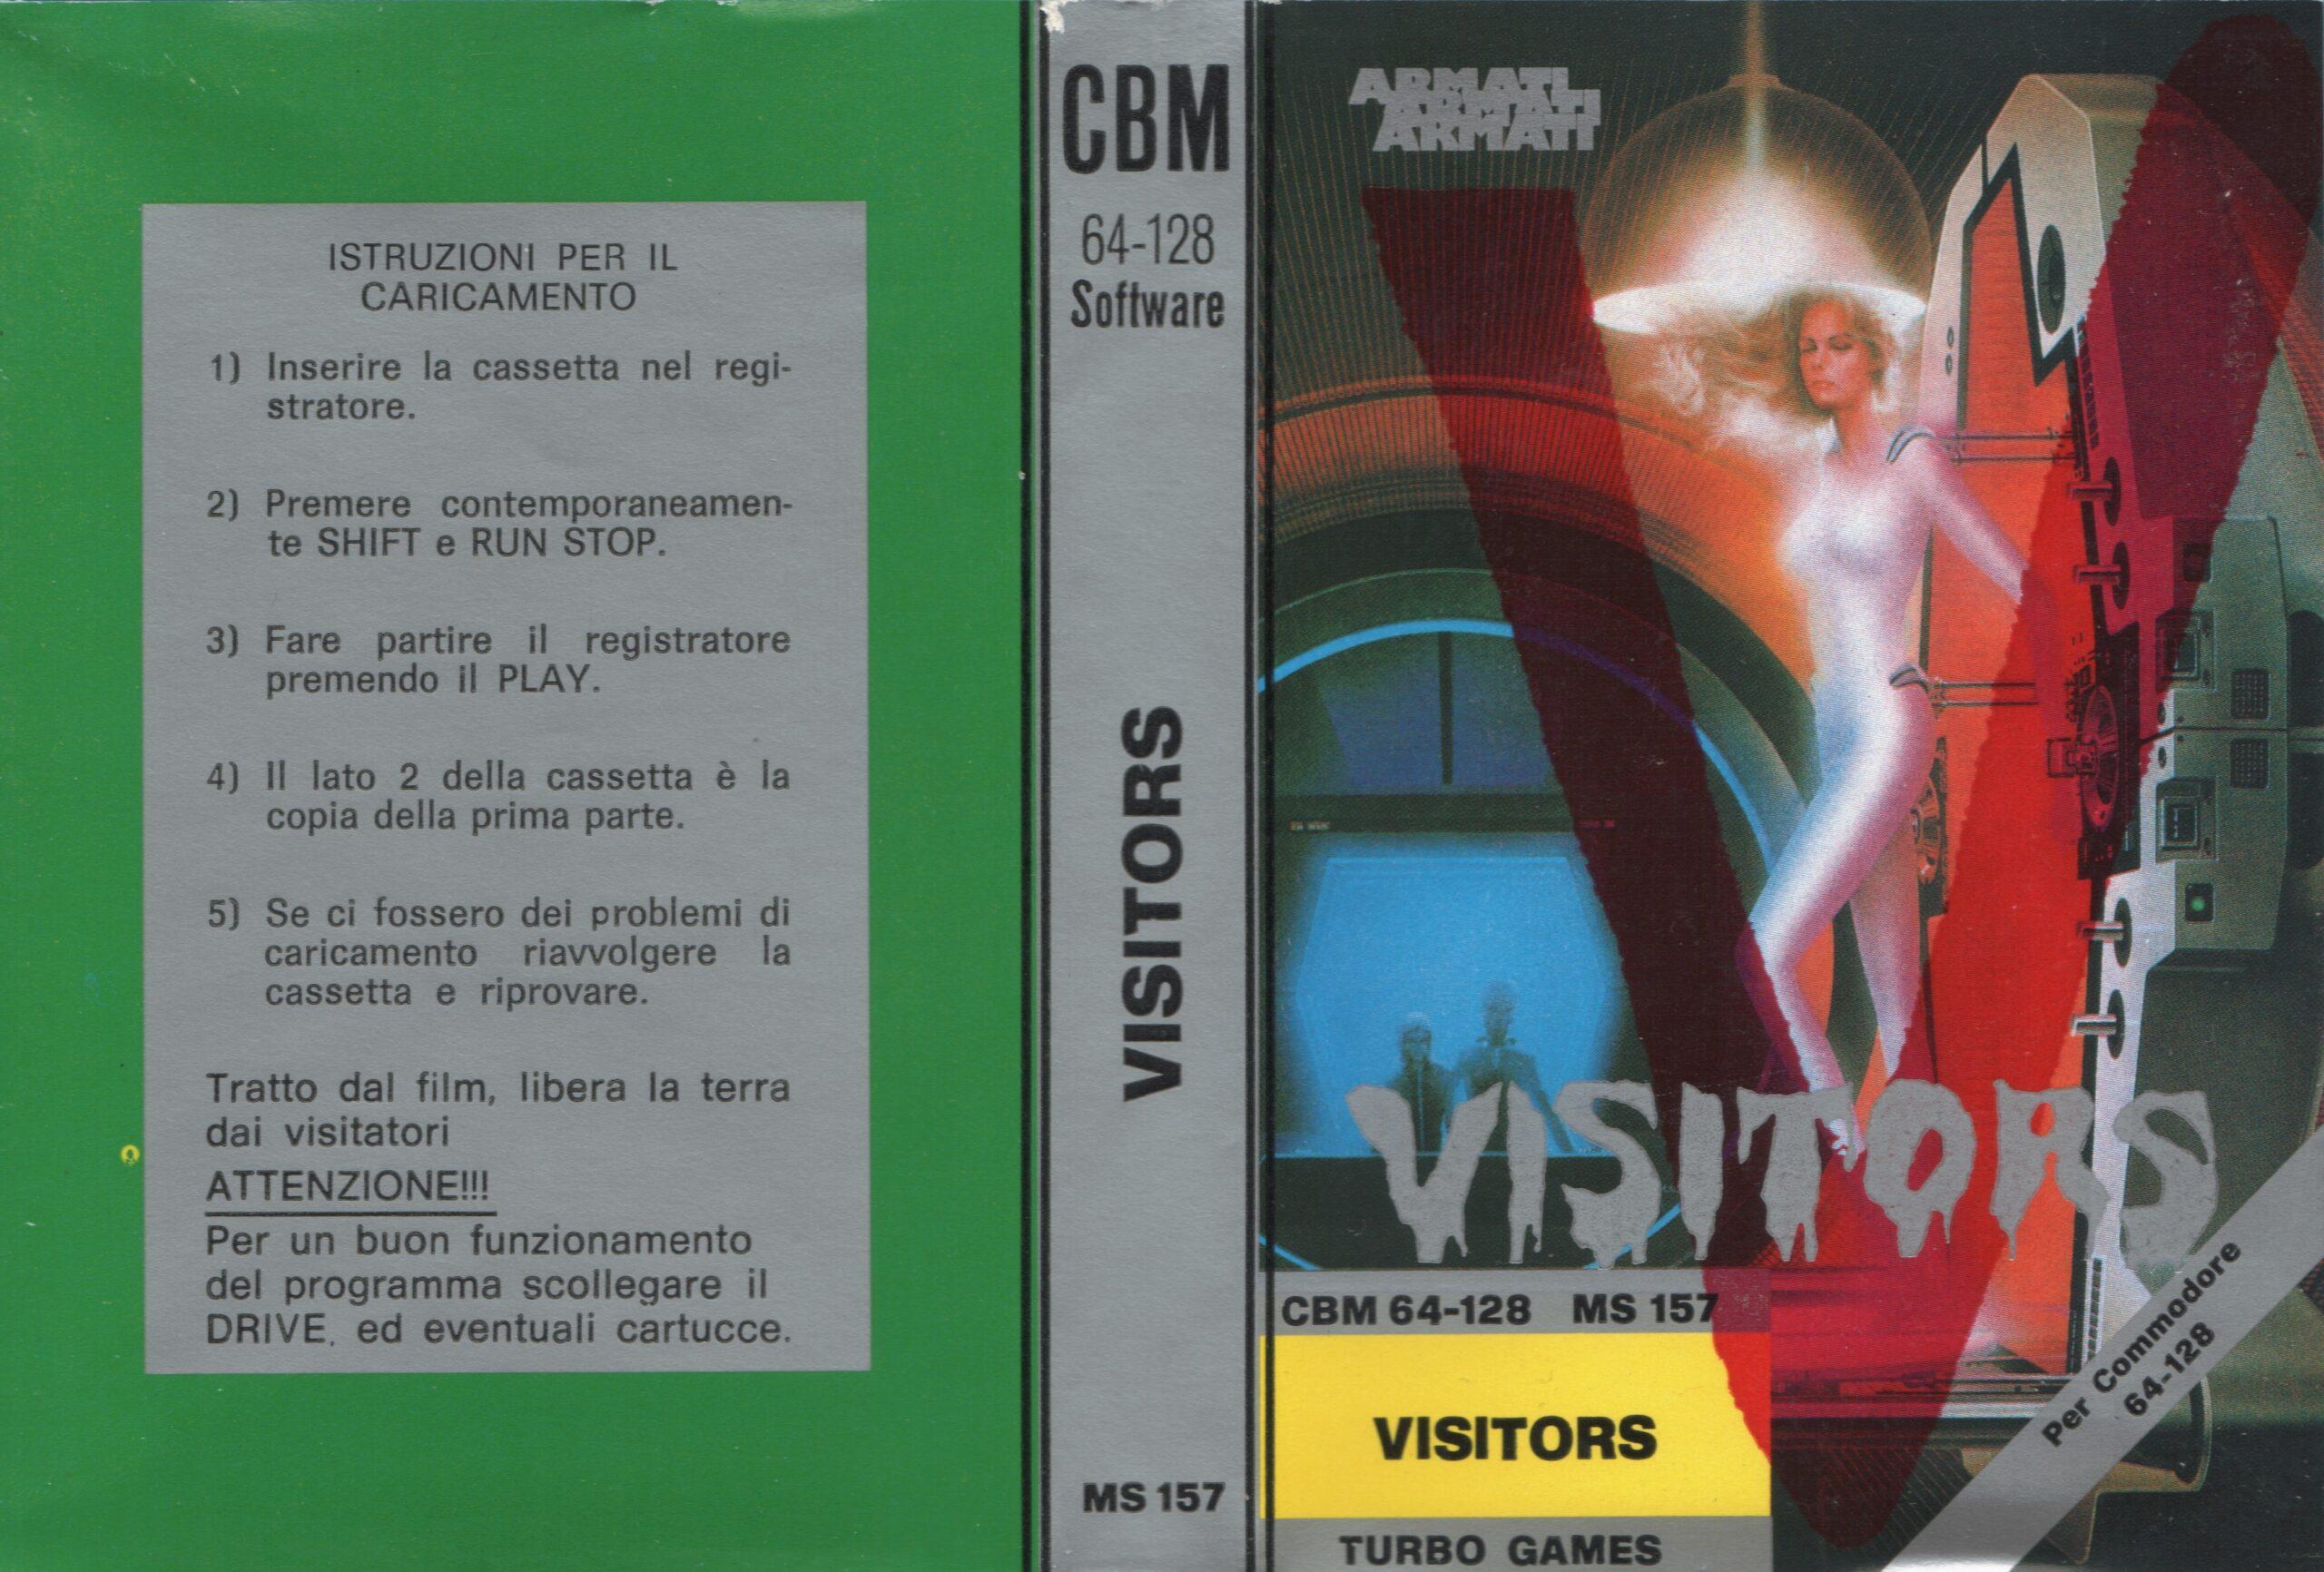 VISITORS MS 157